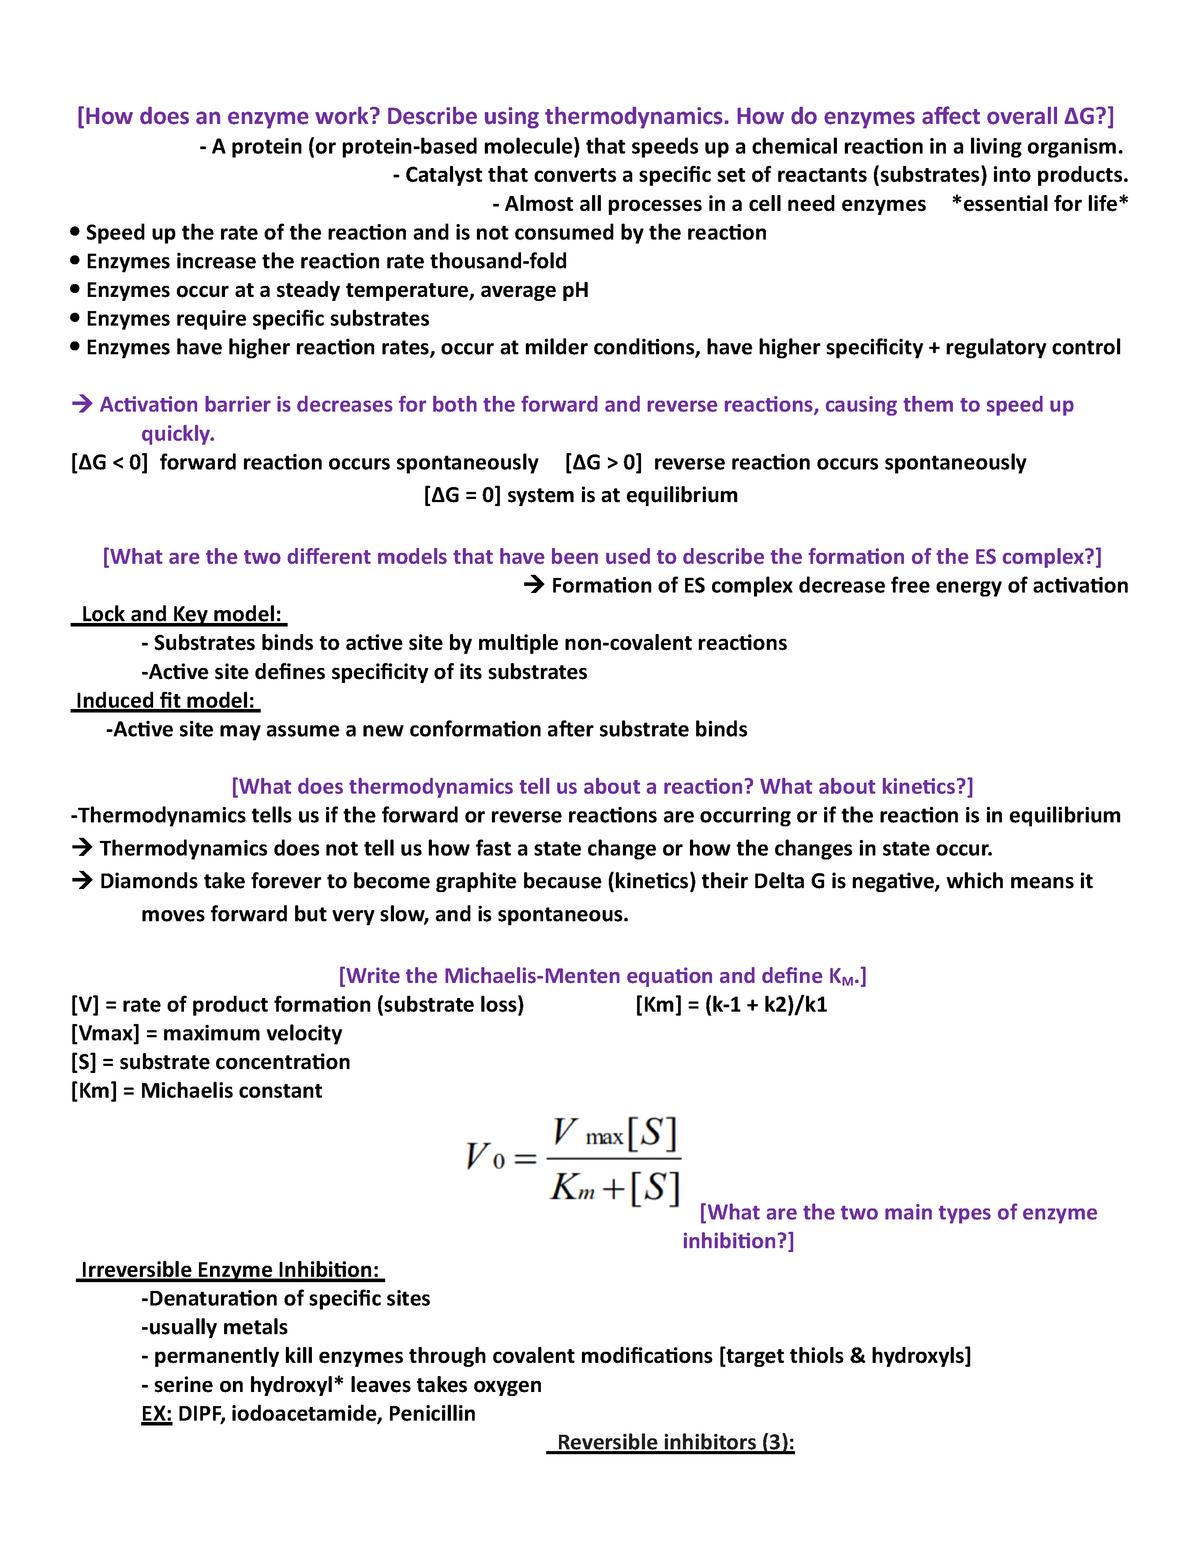 SI Session 7 Complete - BIOL 4087: Basic Biochemistry - StuDocu